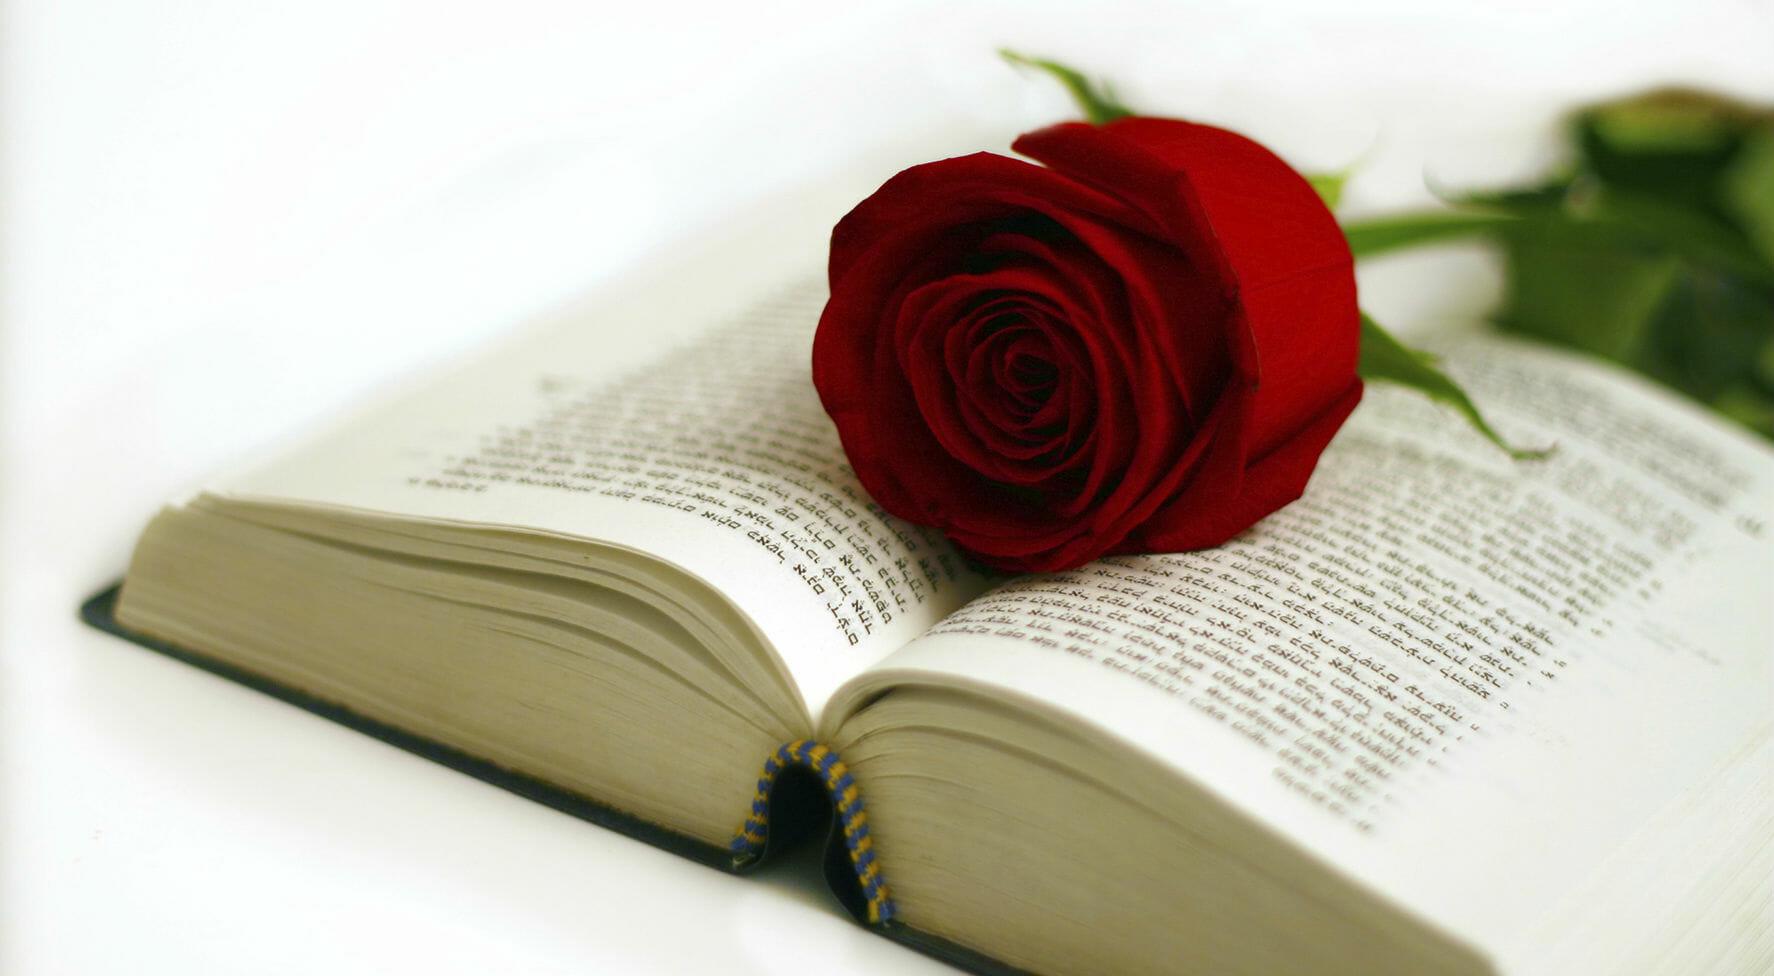 rose libri